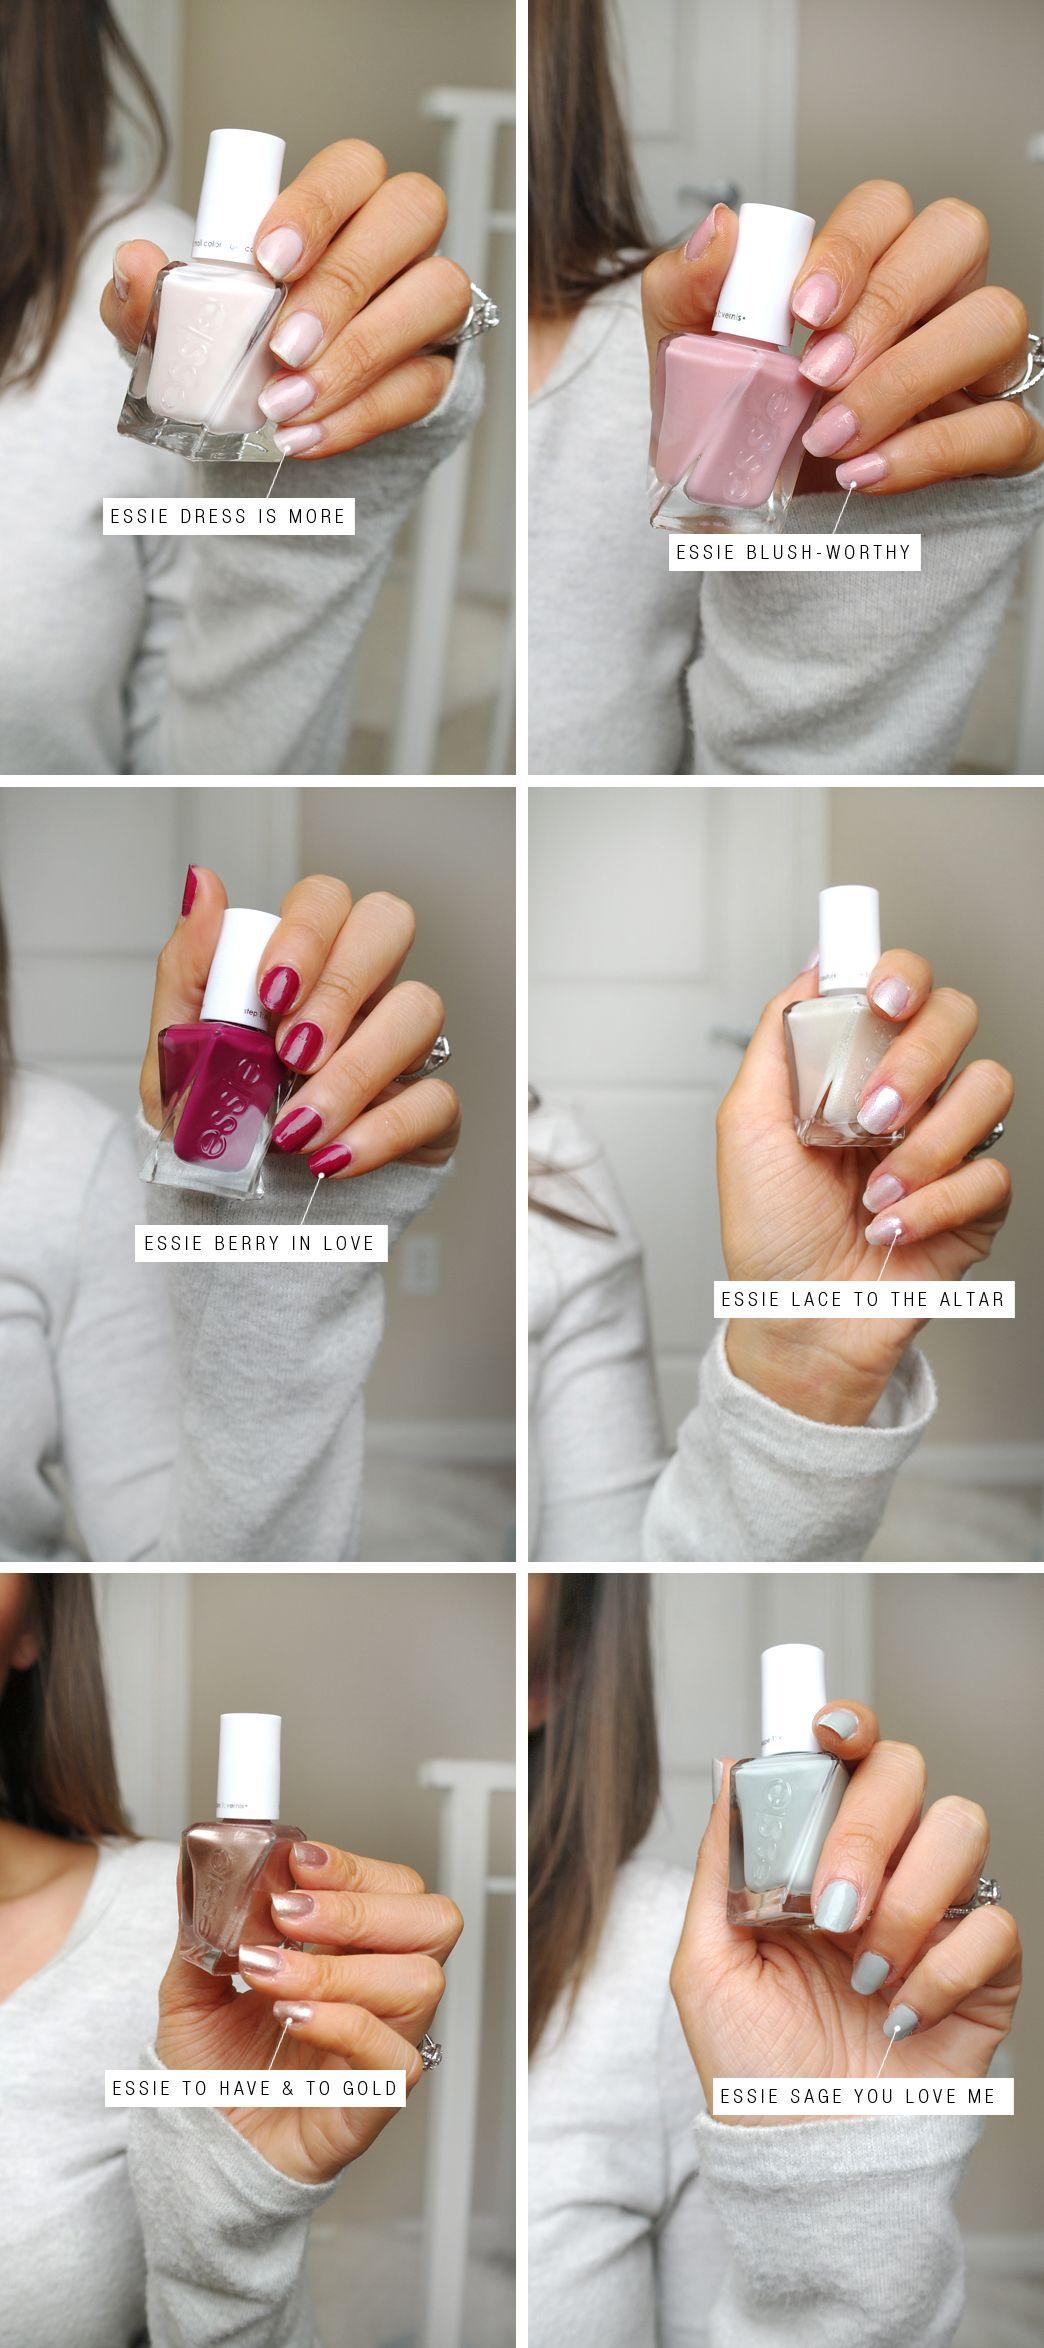 Linda Evangelista Presents Moschino S Fresh Couture Fragrance